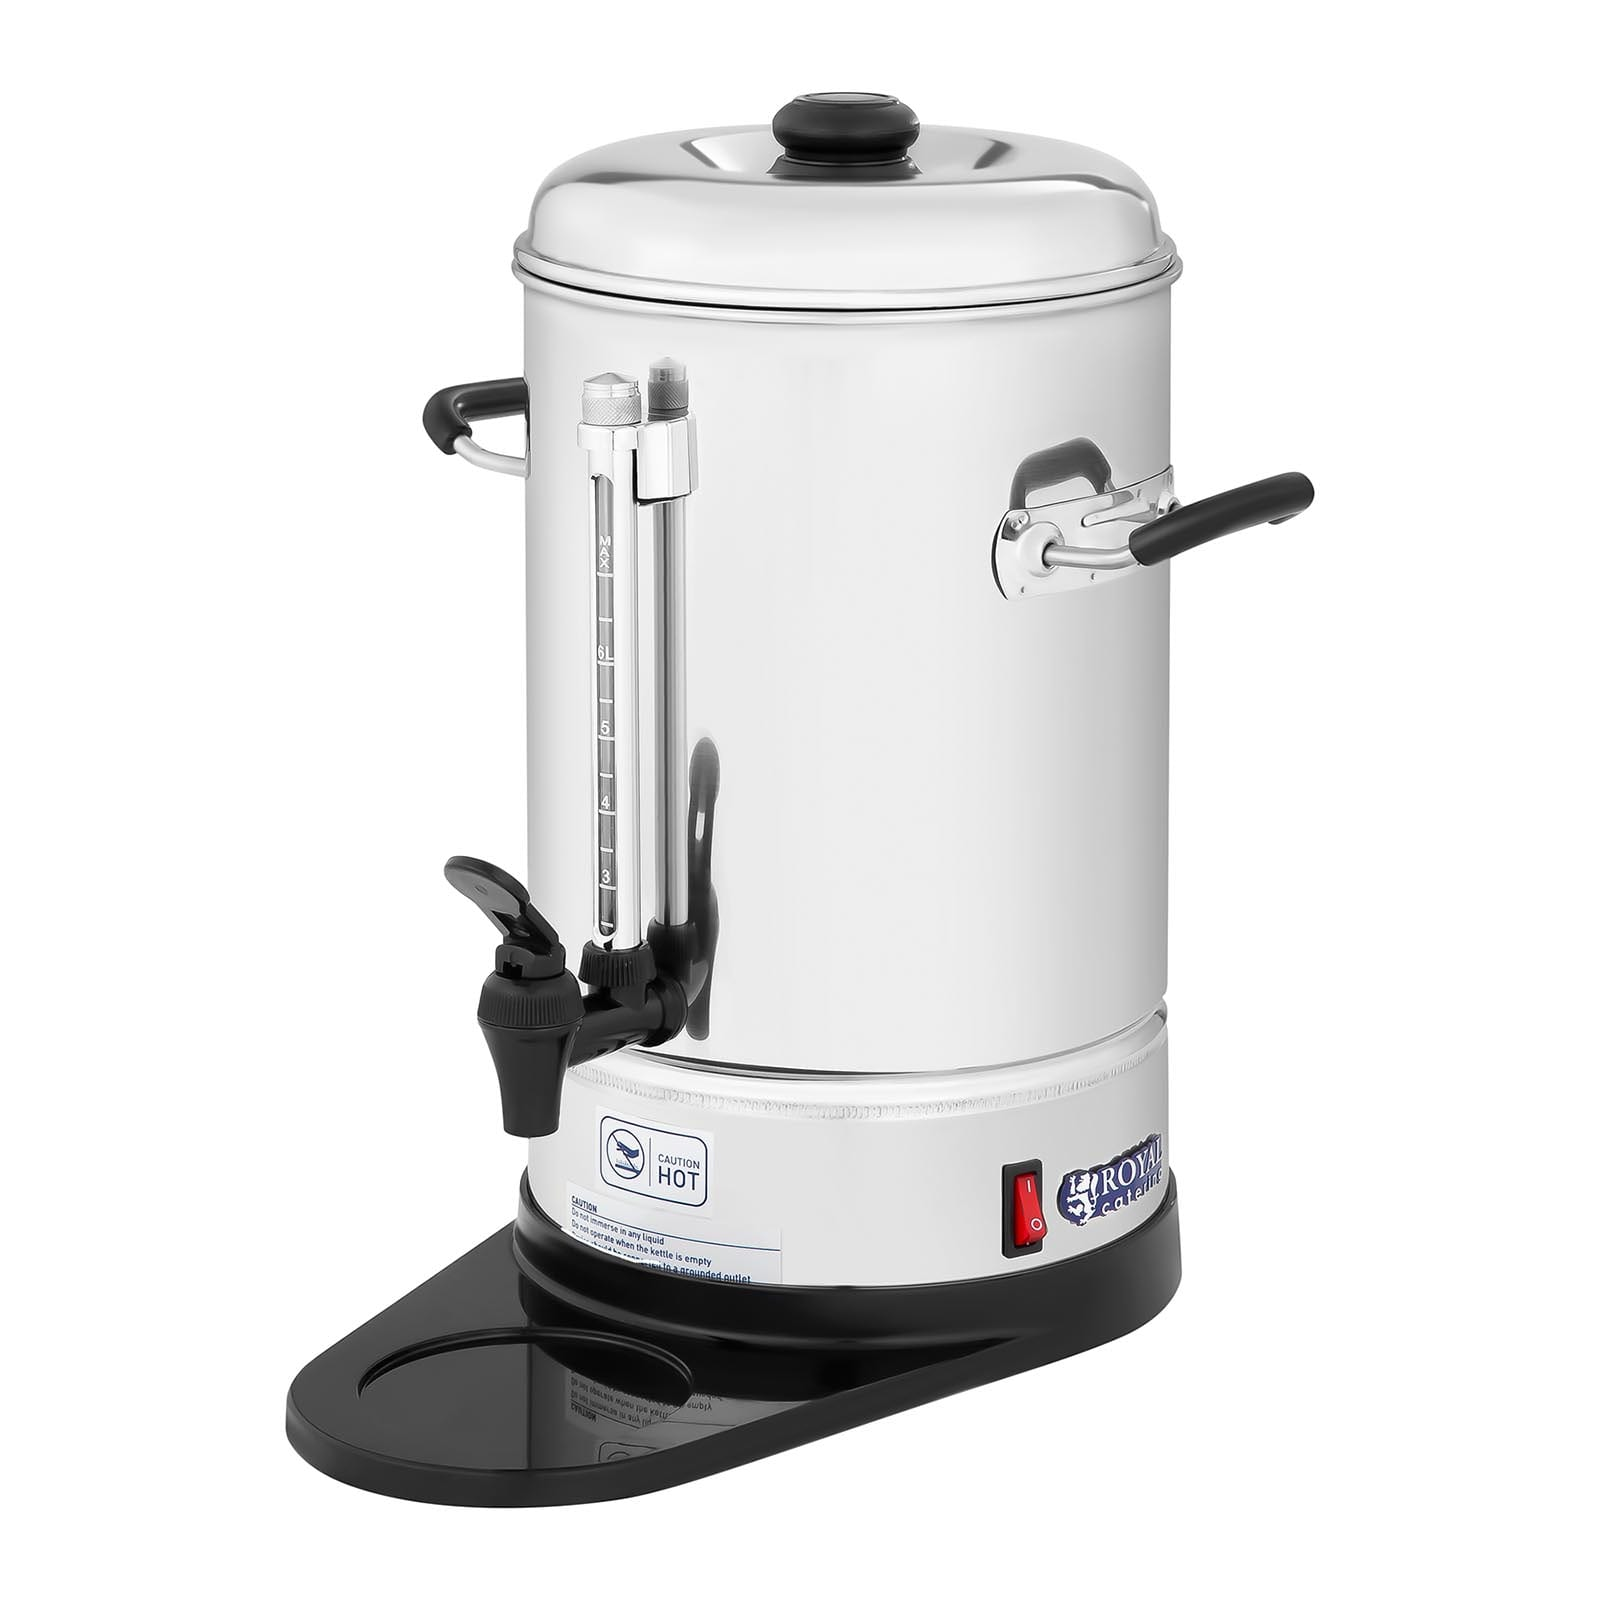 Hyra-kaffebryggare-dubbla-kannor